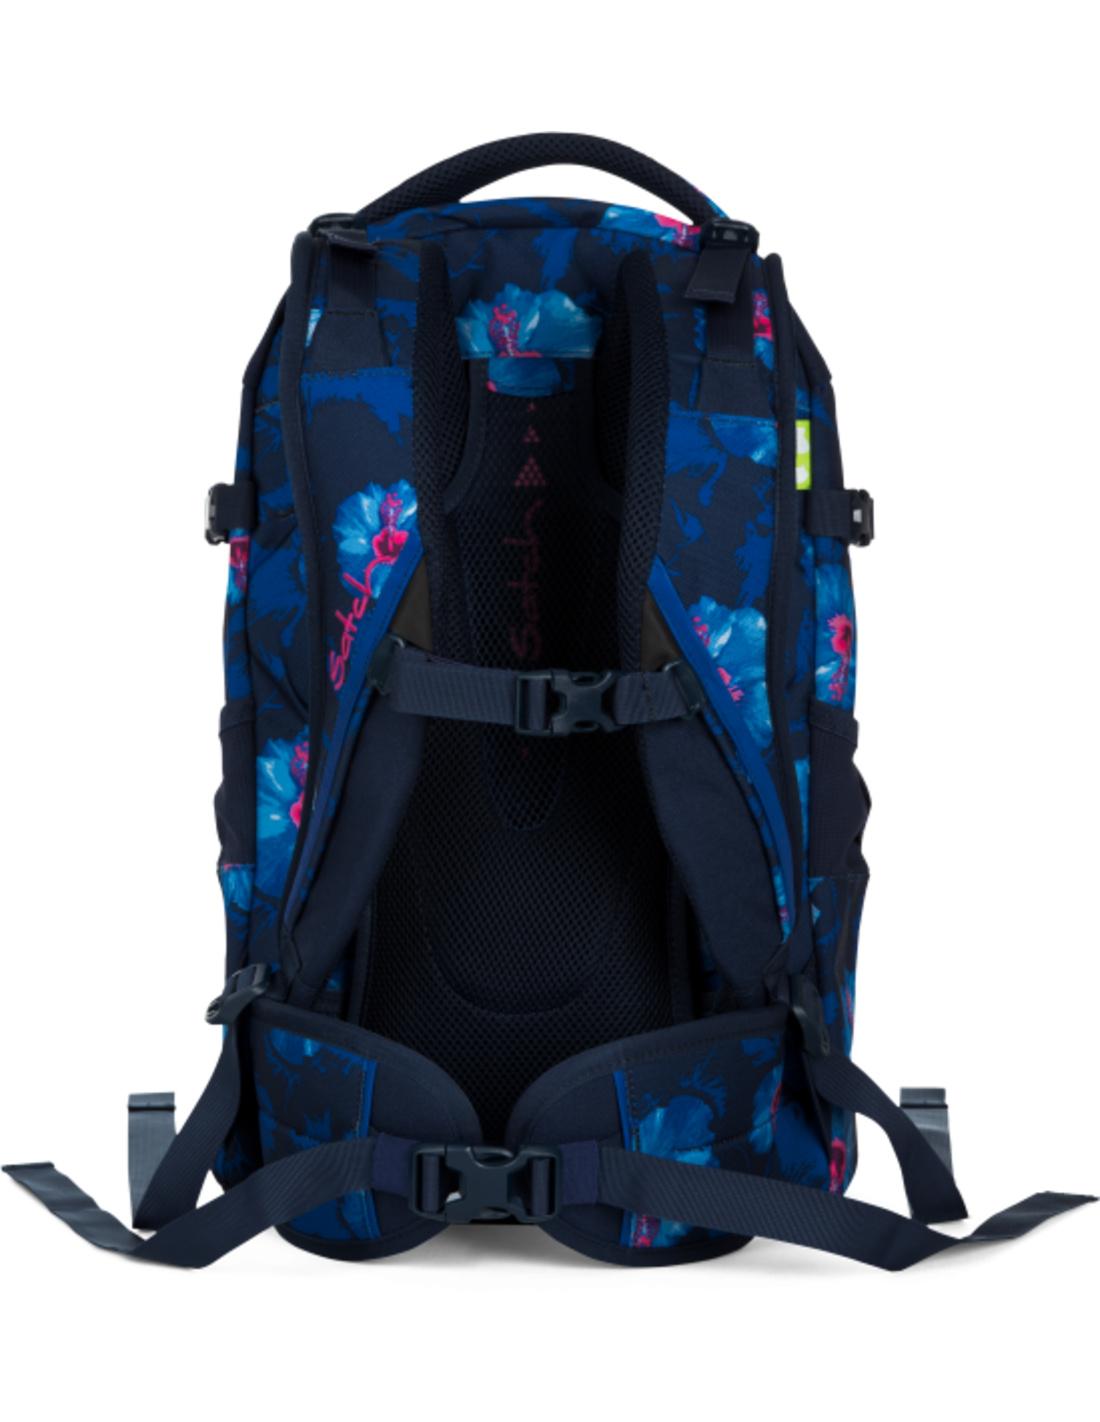 Satch Satch Pack School Rugzak - 30 liter backpack - Waikiki blue